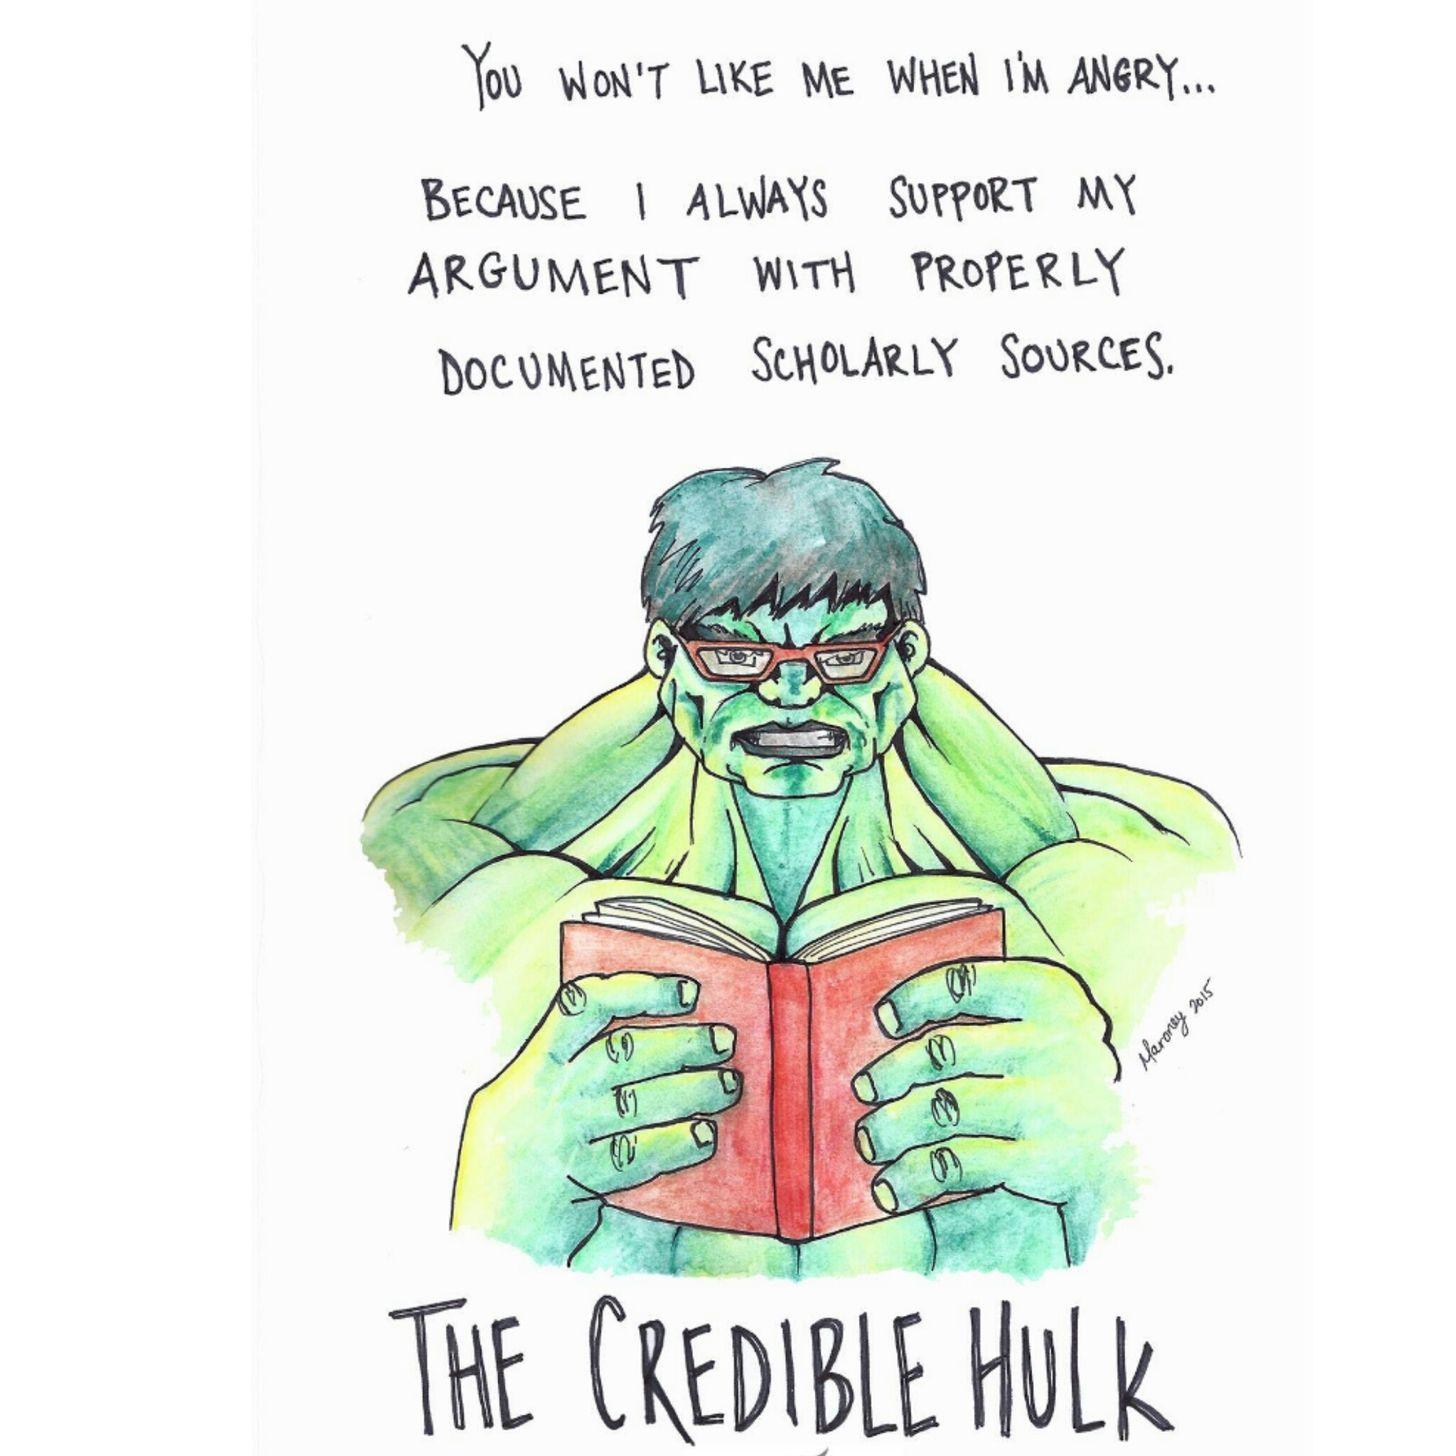 The Credible Hulk